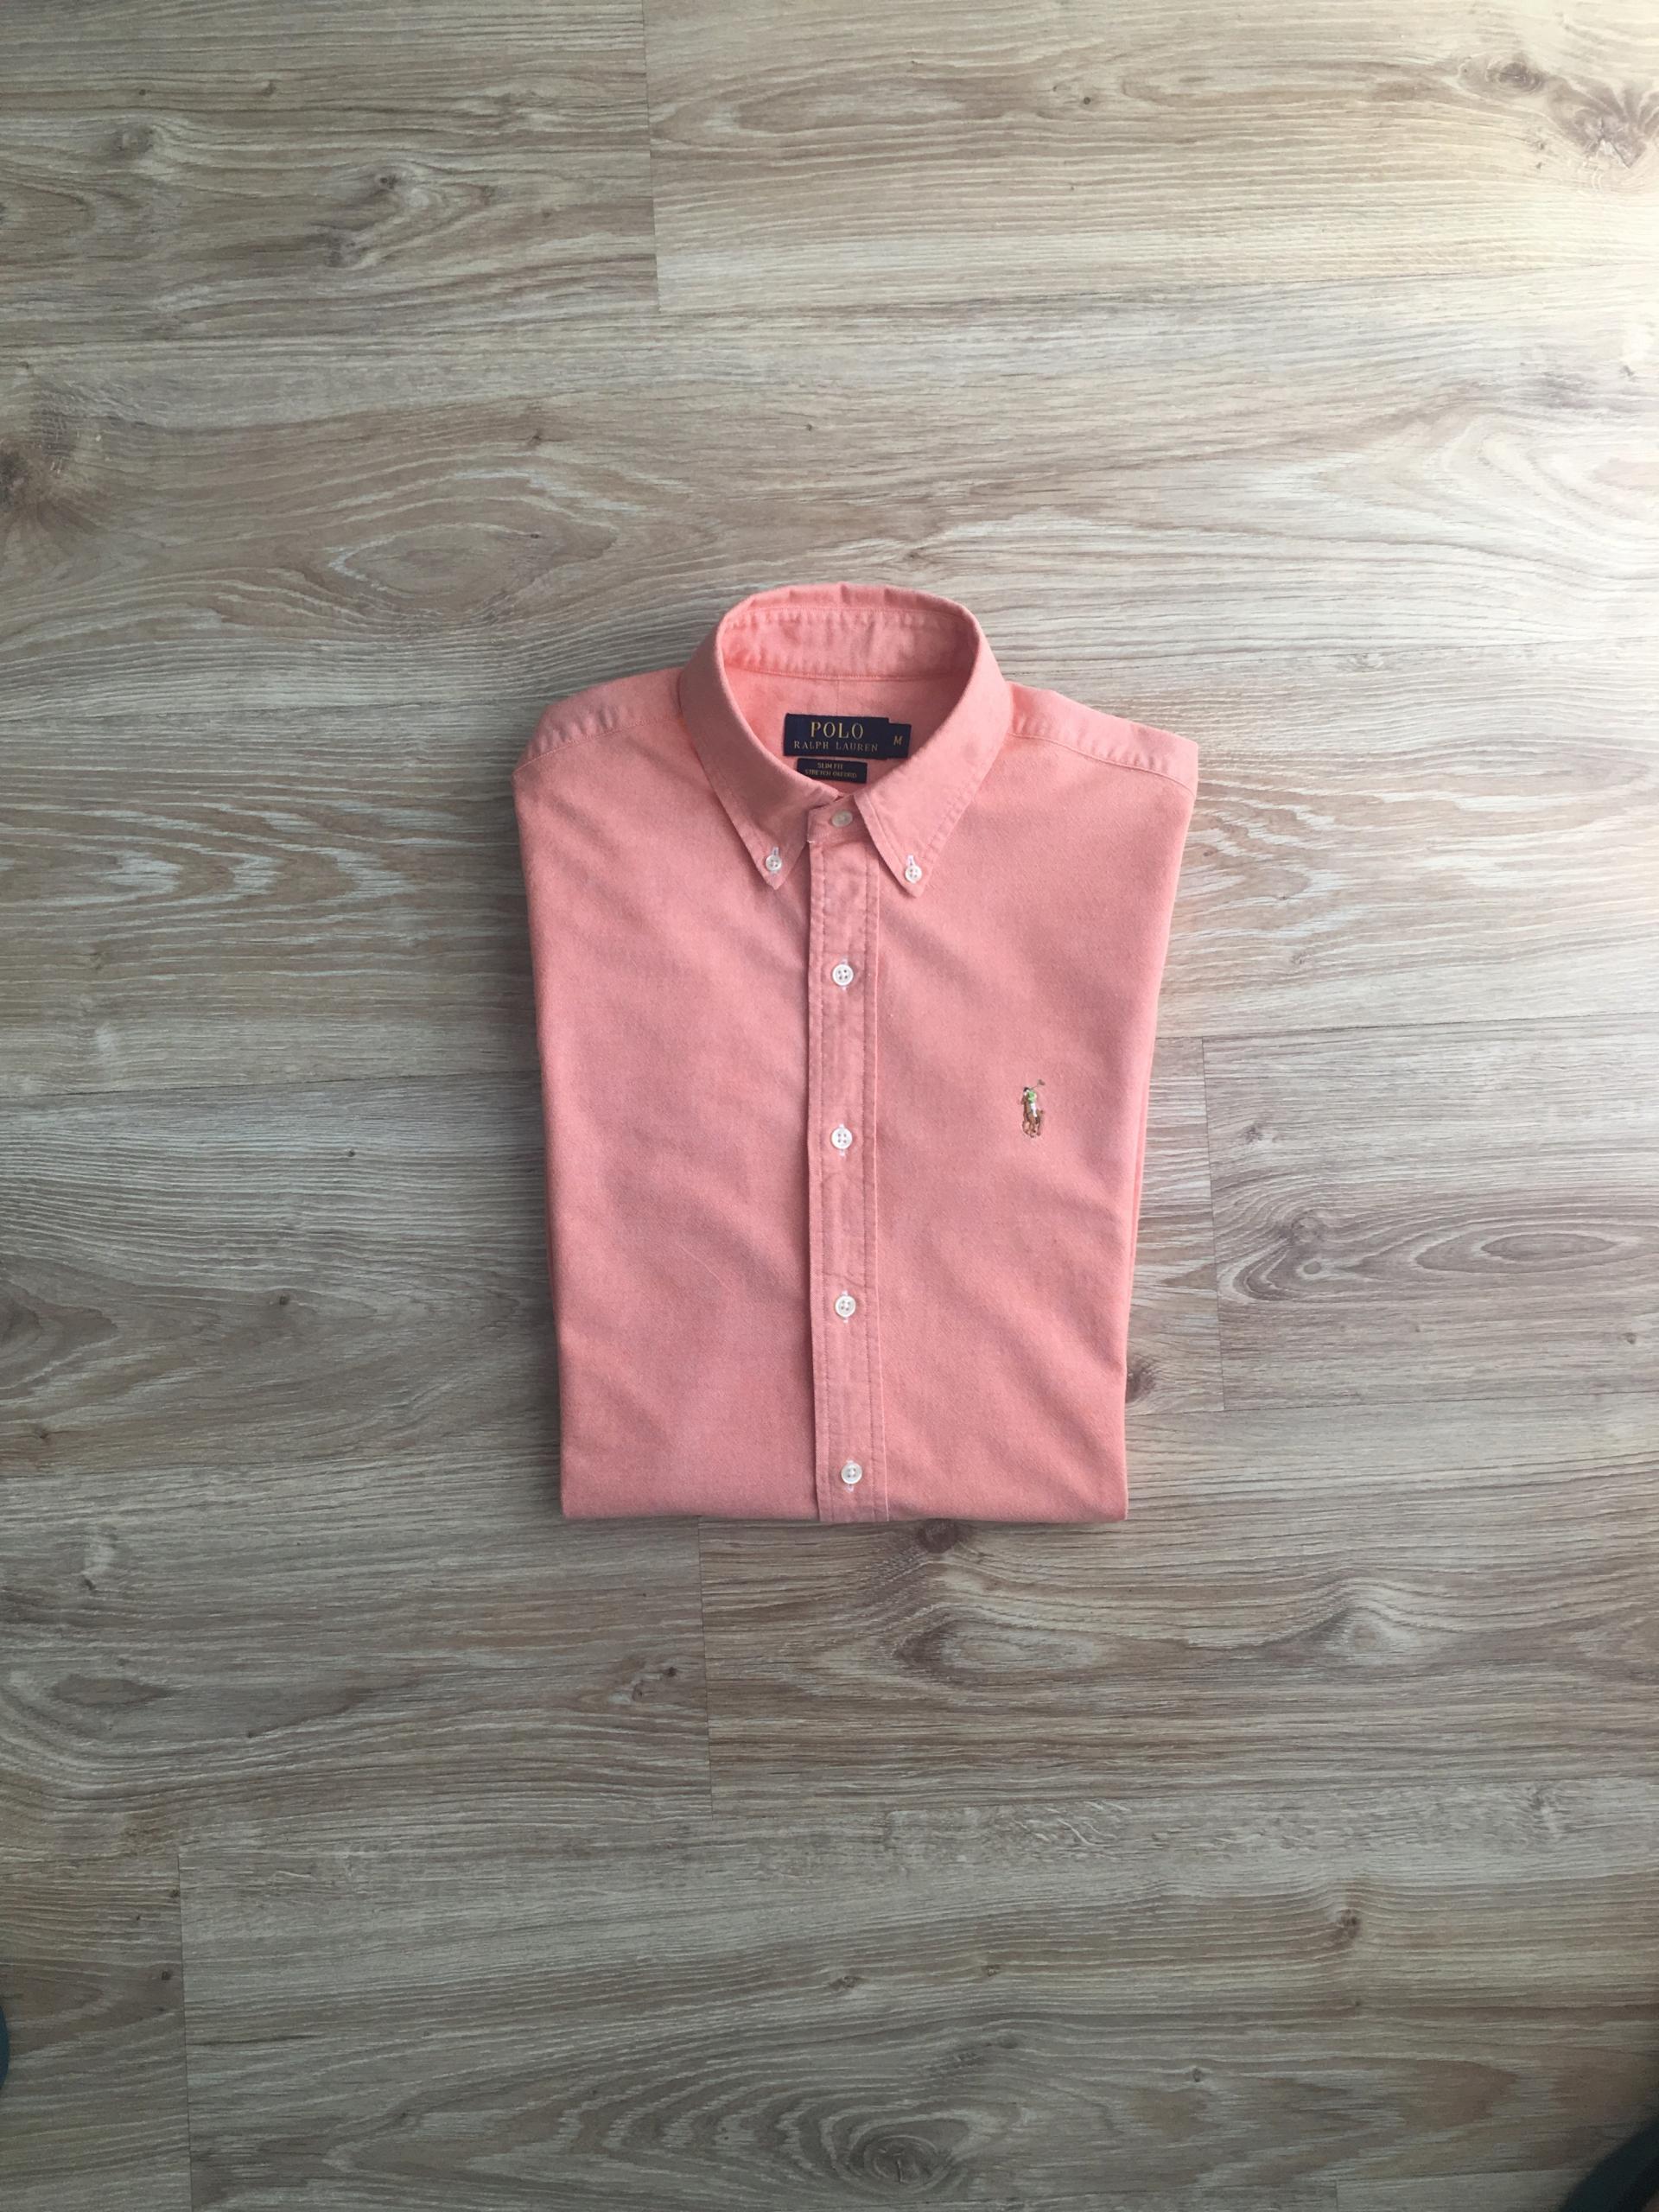 Oryginalna Koszula Polo Ralph Lauren